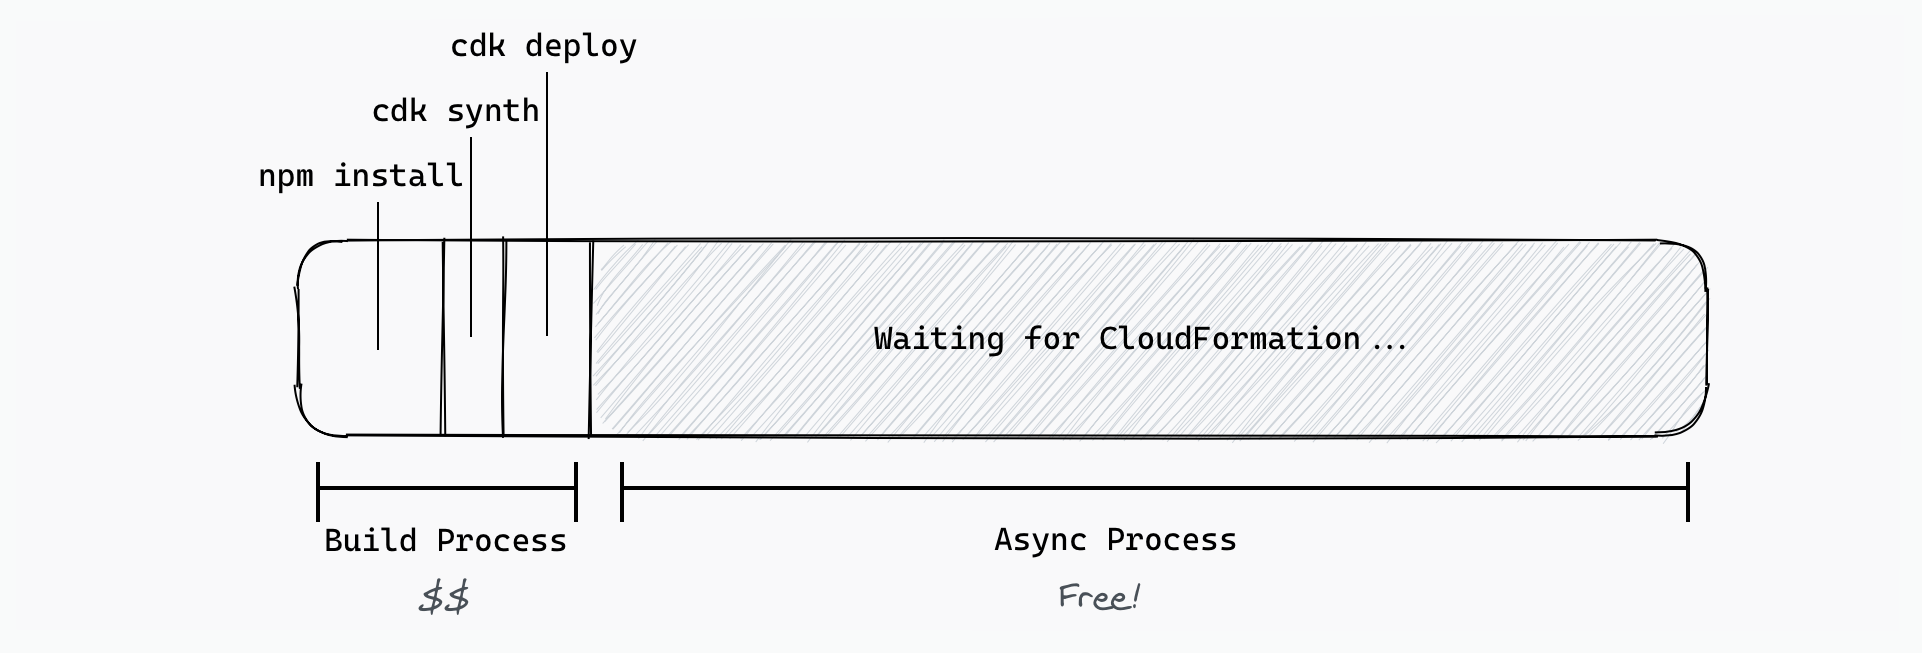 CDK deployment lifecycle